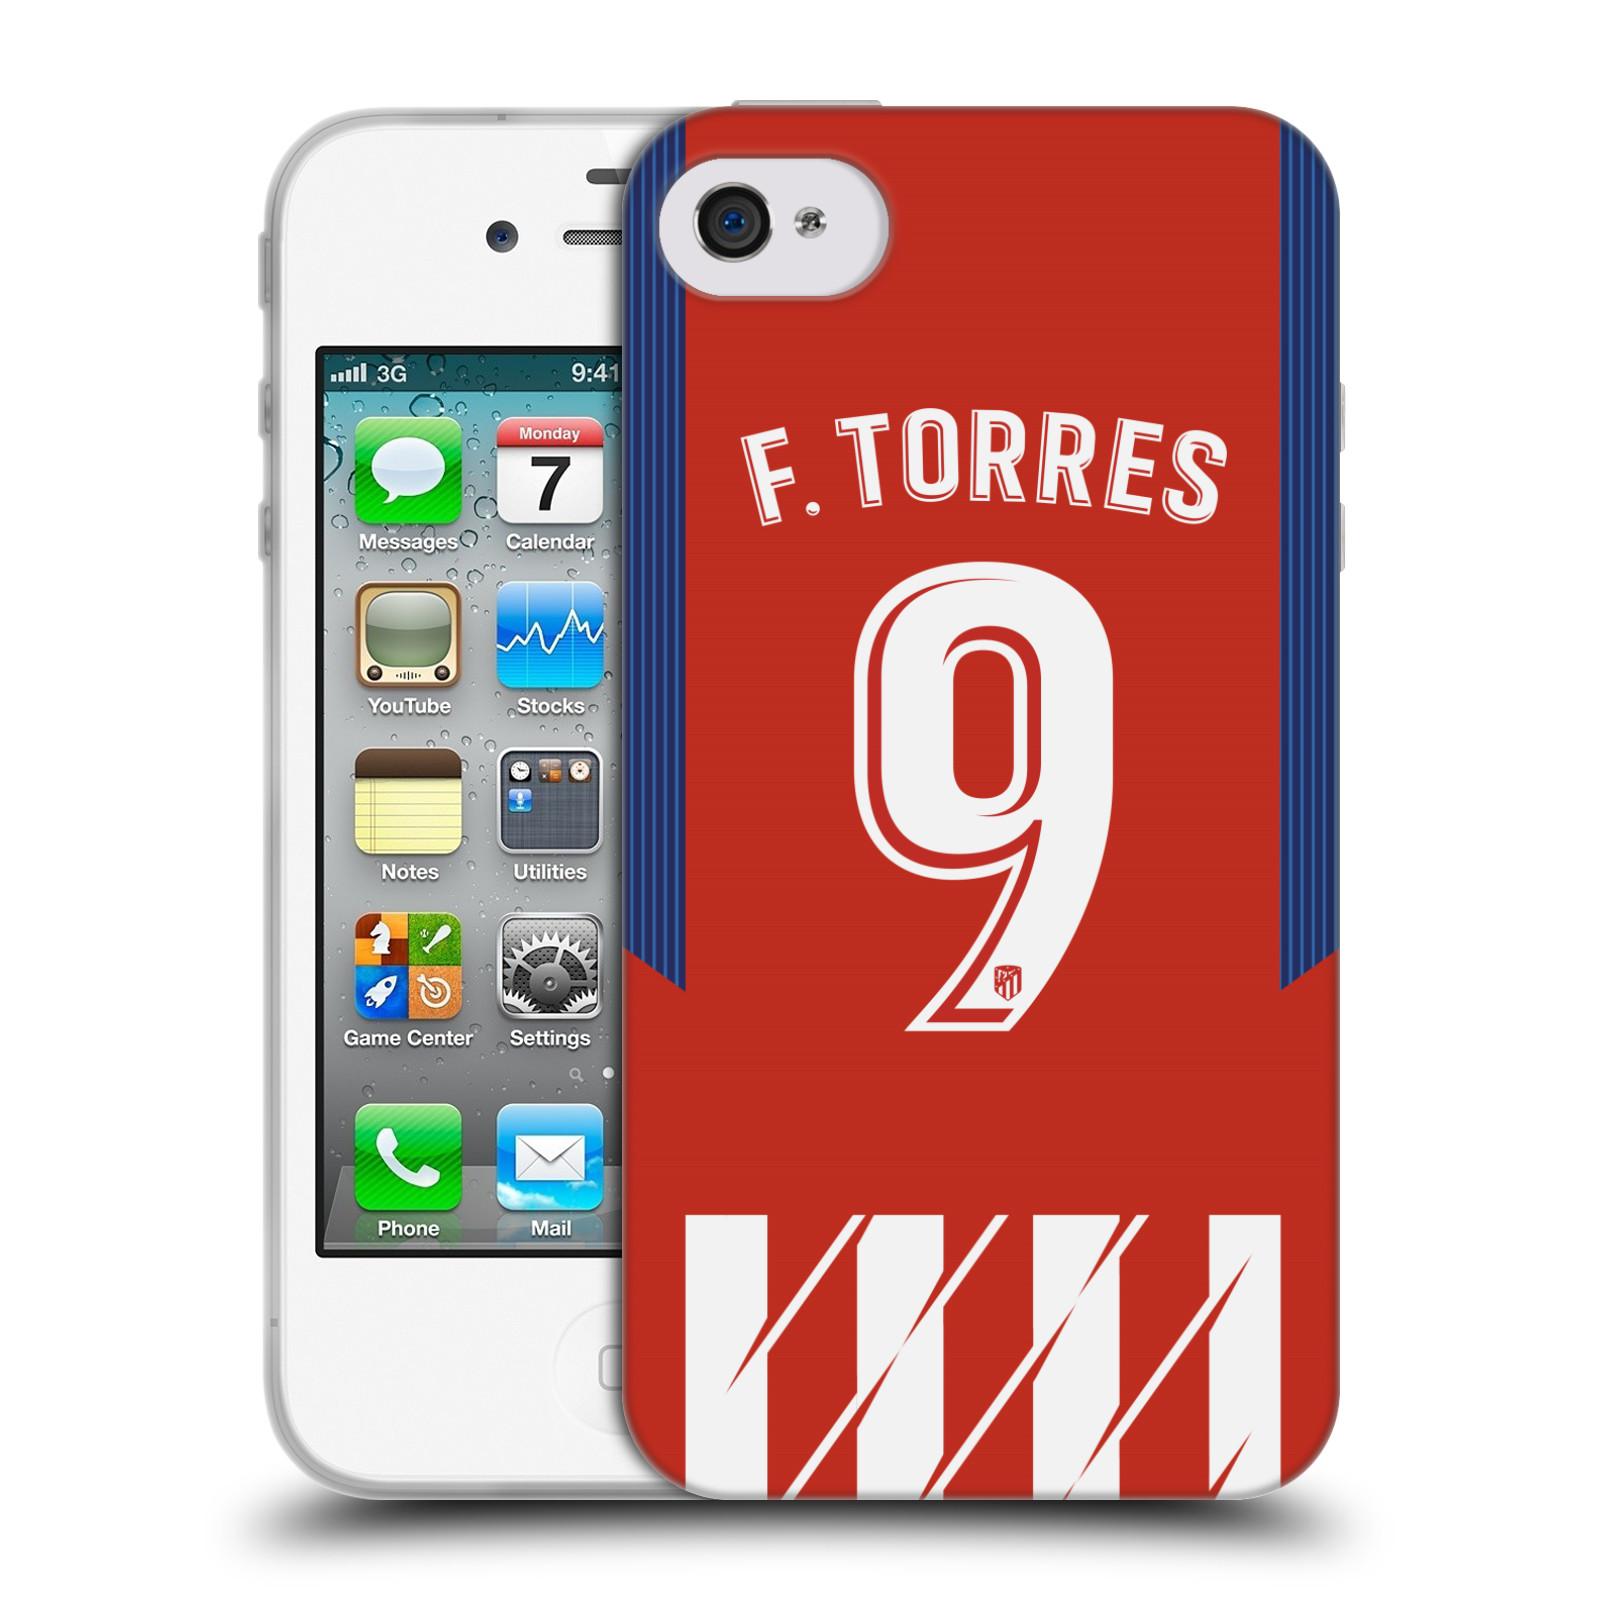 HEAD CASE silikonový obal na mobil Apple Iphone 4 Fotbalový klub Atlético Madrid dres Fernando Torres